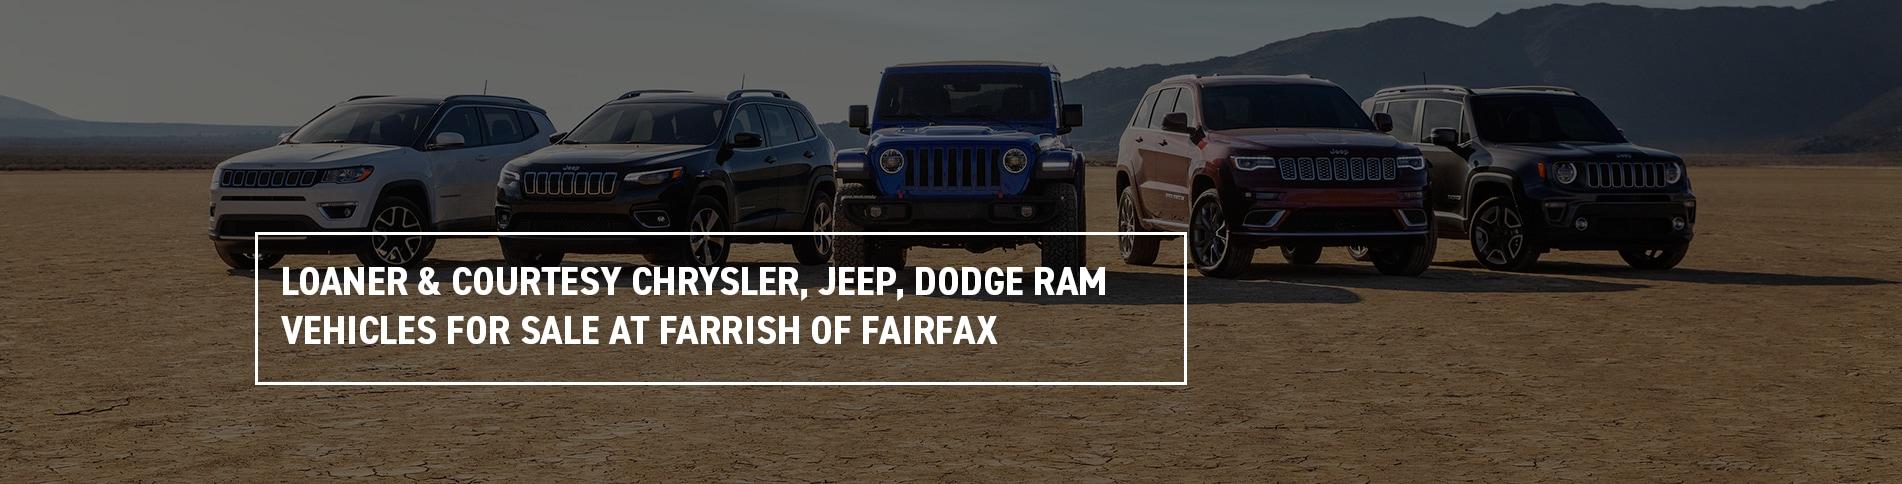 Courtesy Chrysler Jeep Dodge >> Loaner Courtesy Vehicles Farrish Chrysler Jeep Dodge